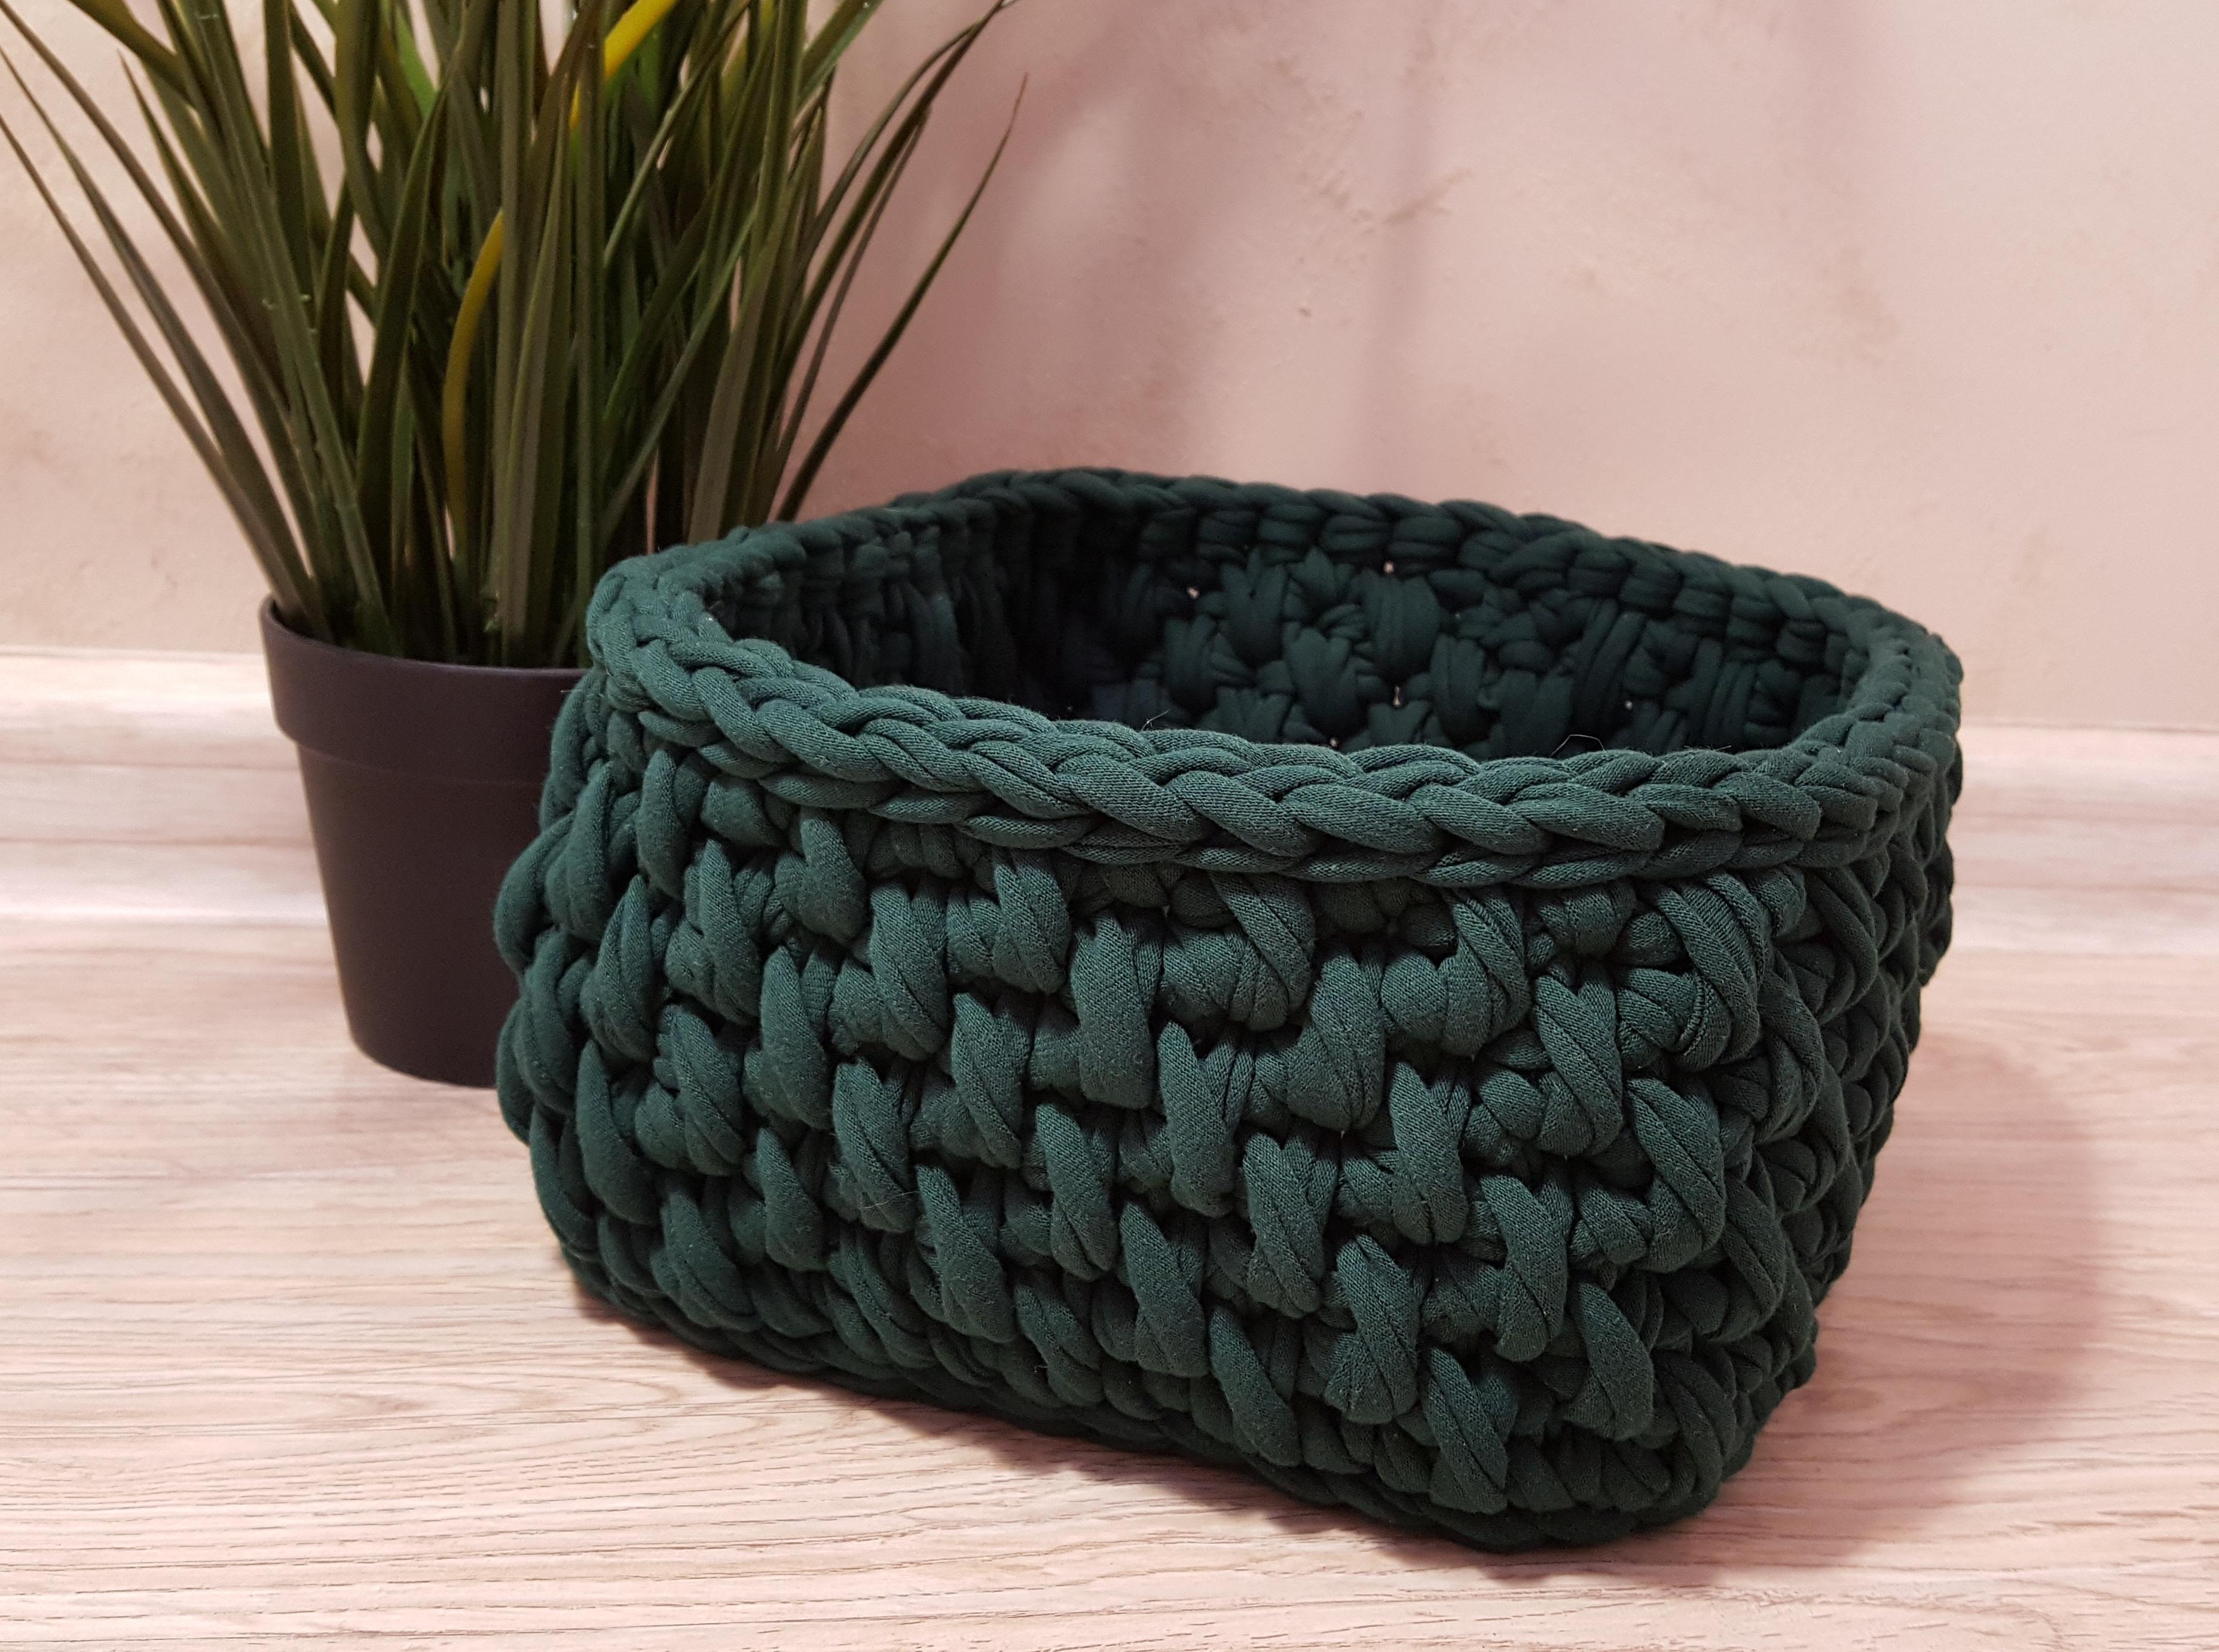 Трикотажная корзина для вещей темно-зеленая (арт. М407)